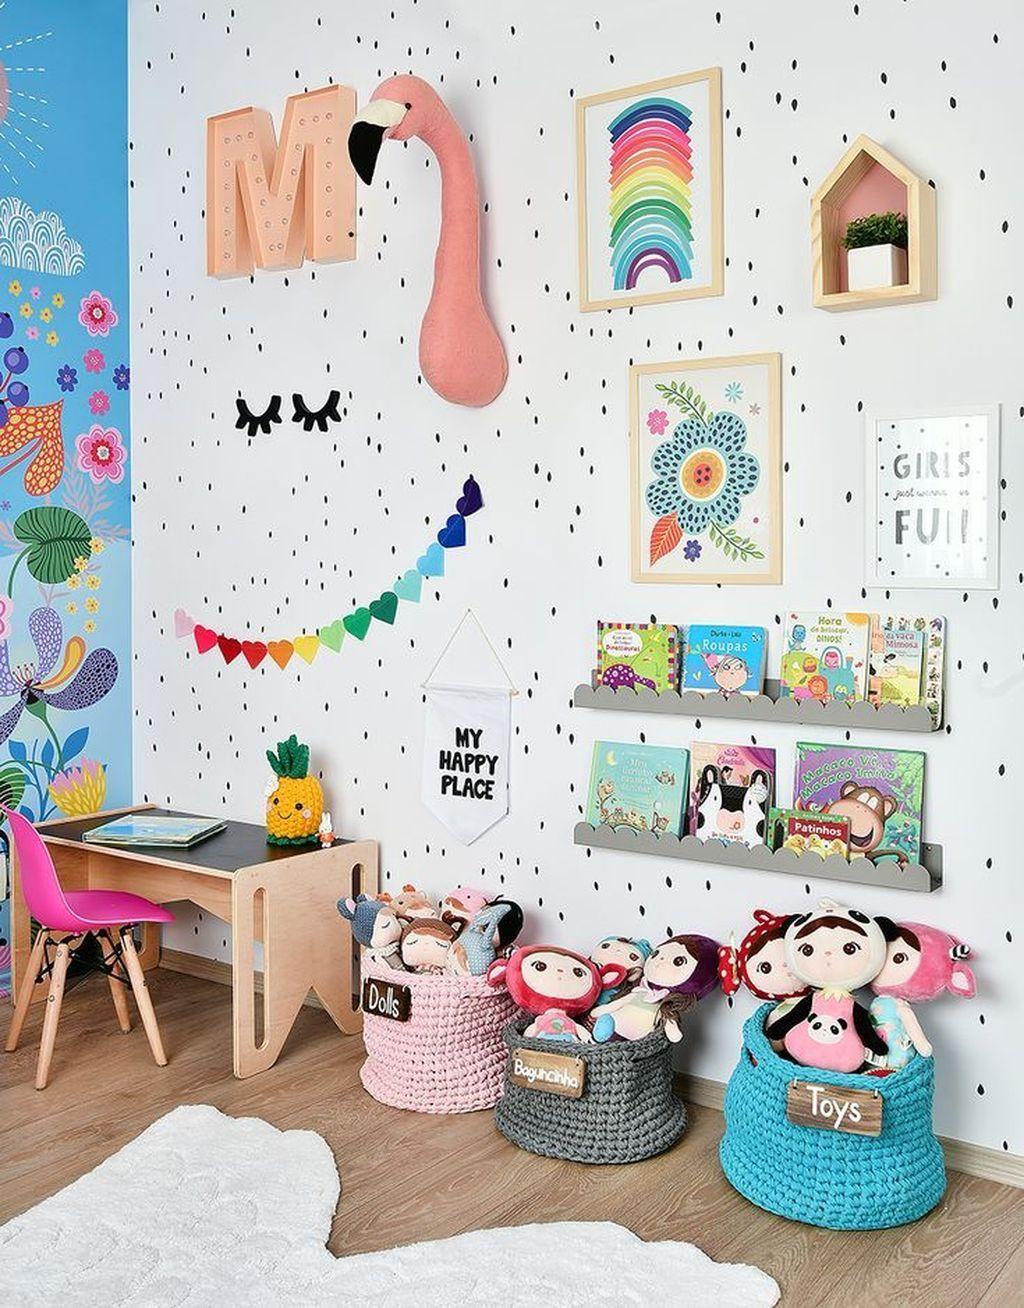 34 Extraordinary Kids Room Organization Design Ideas On A Budget